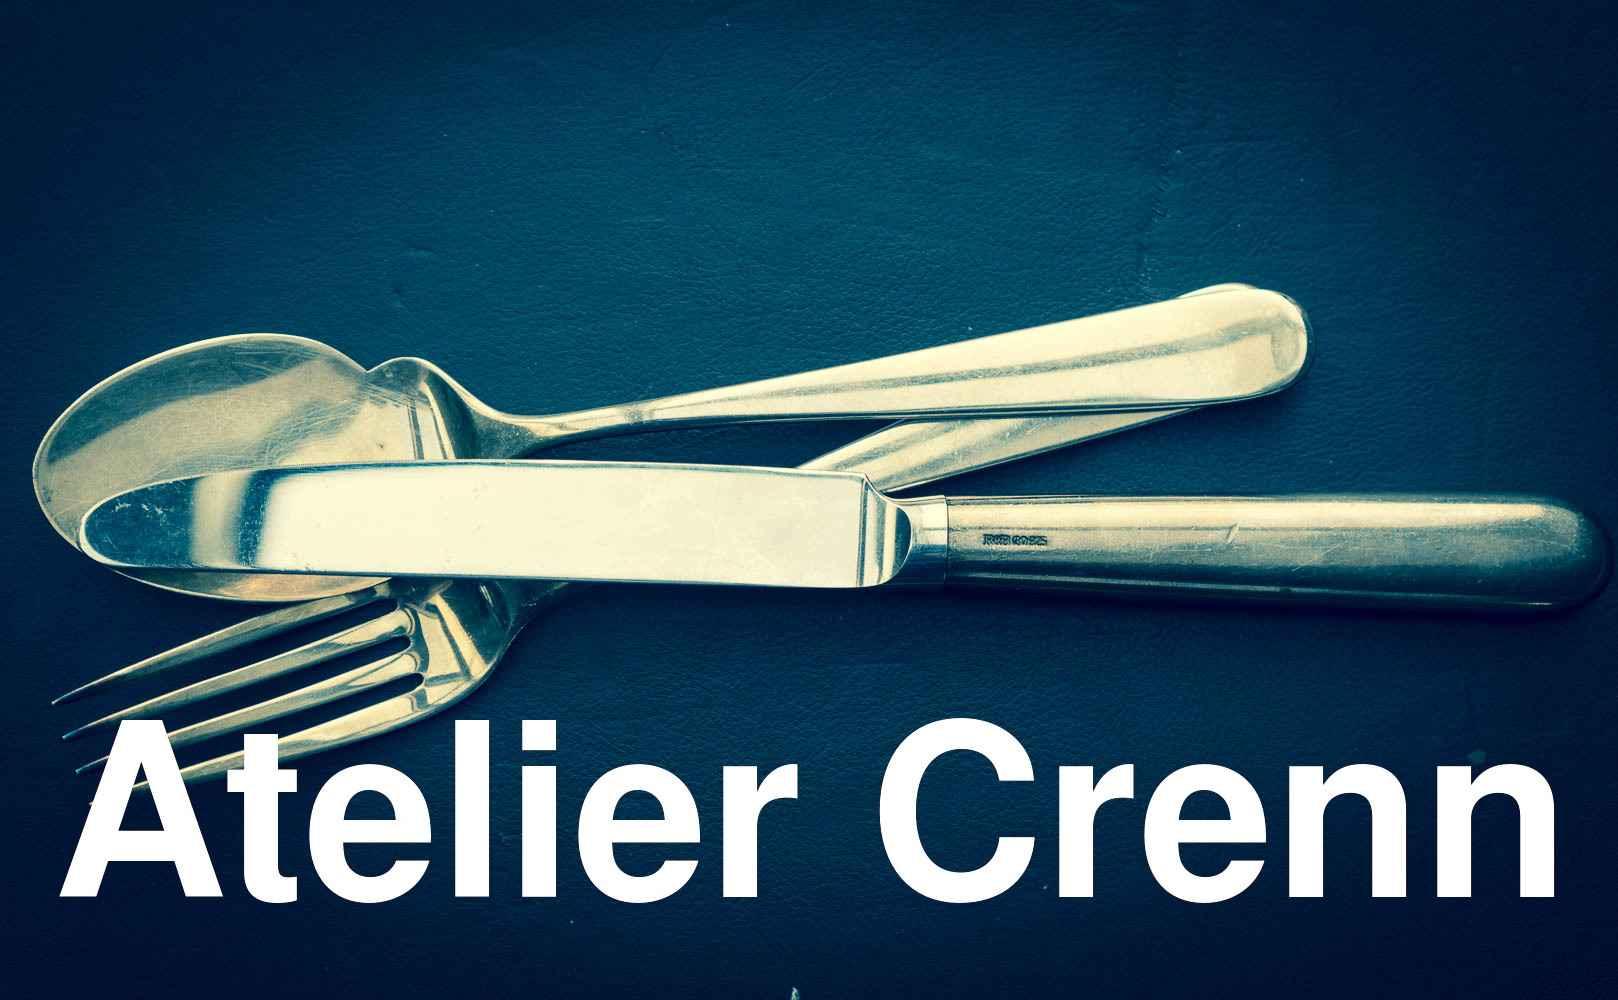 Restaurantkritik: Atelier Crenn in San Francisco, USA